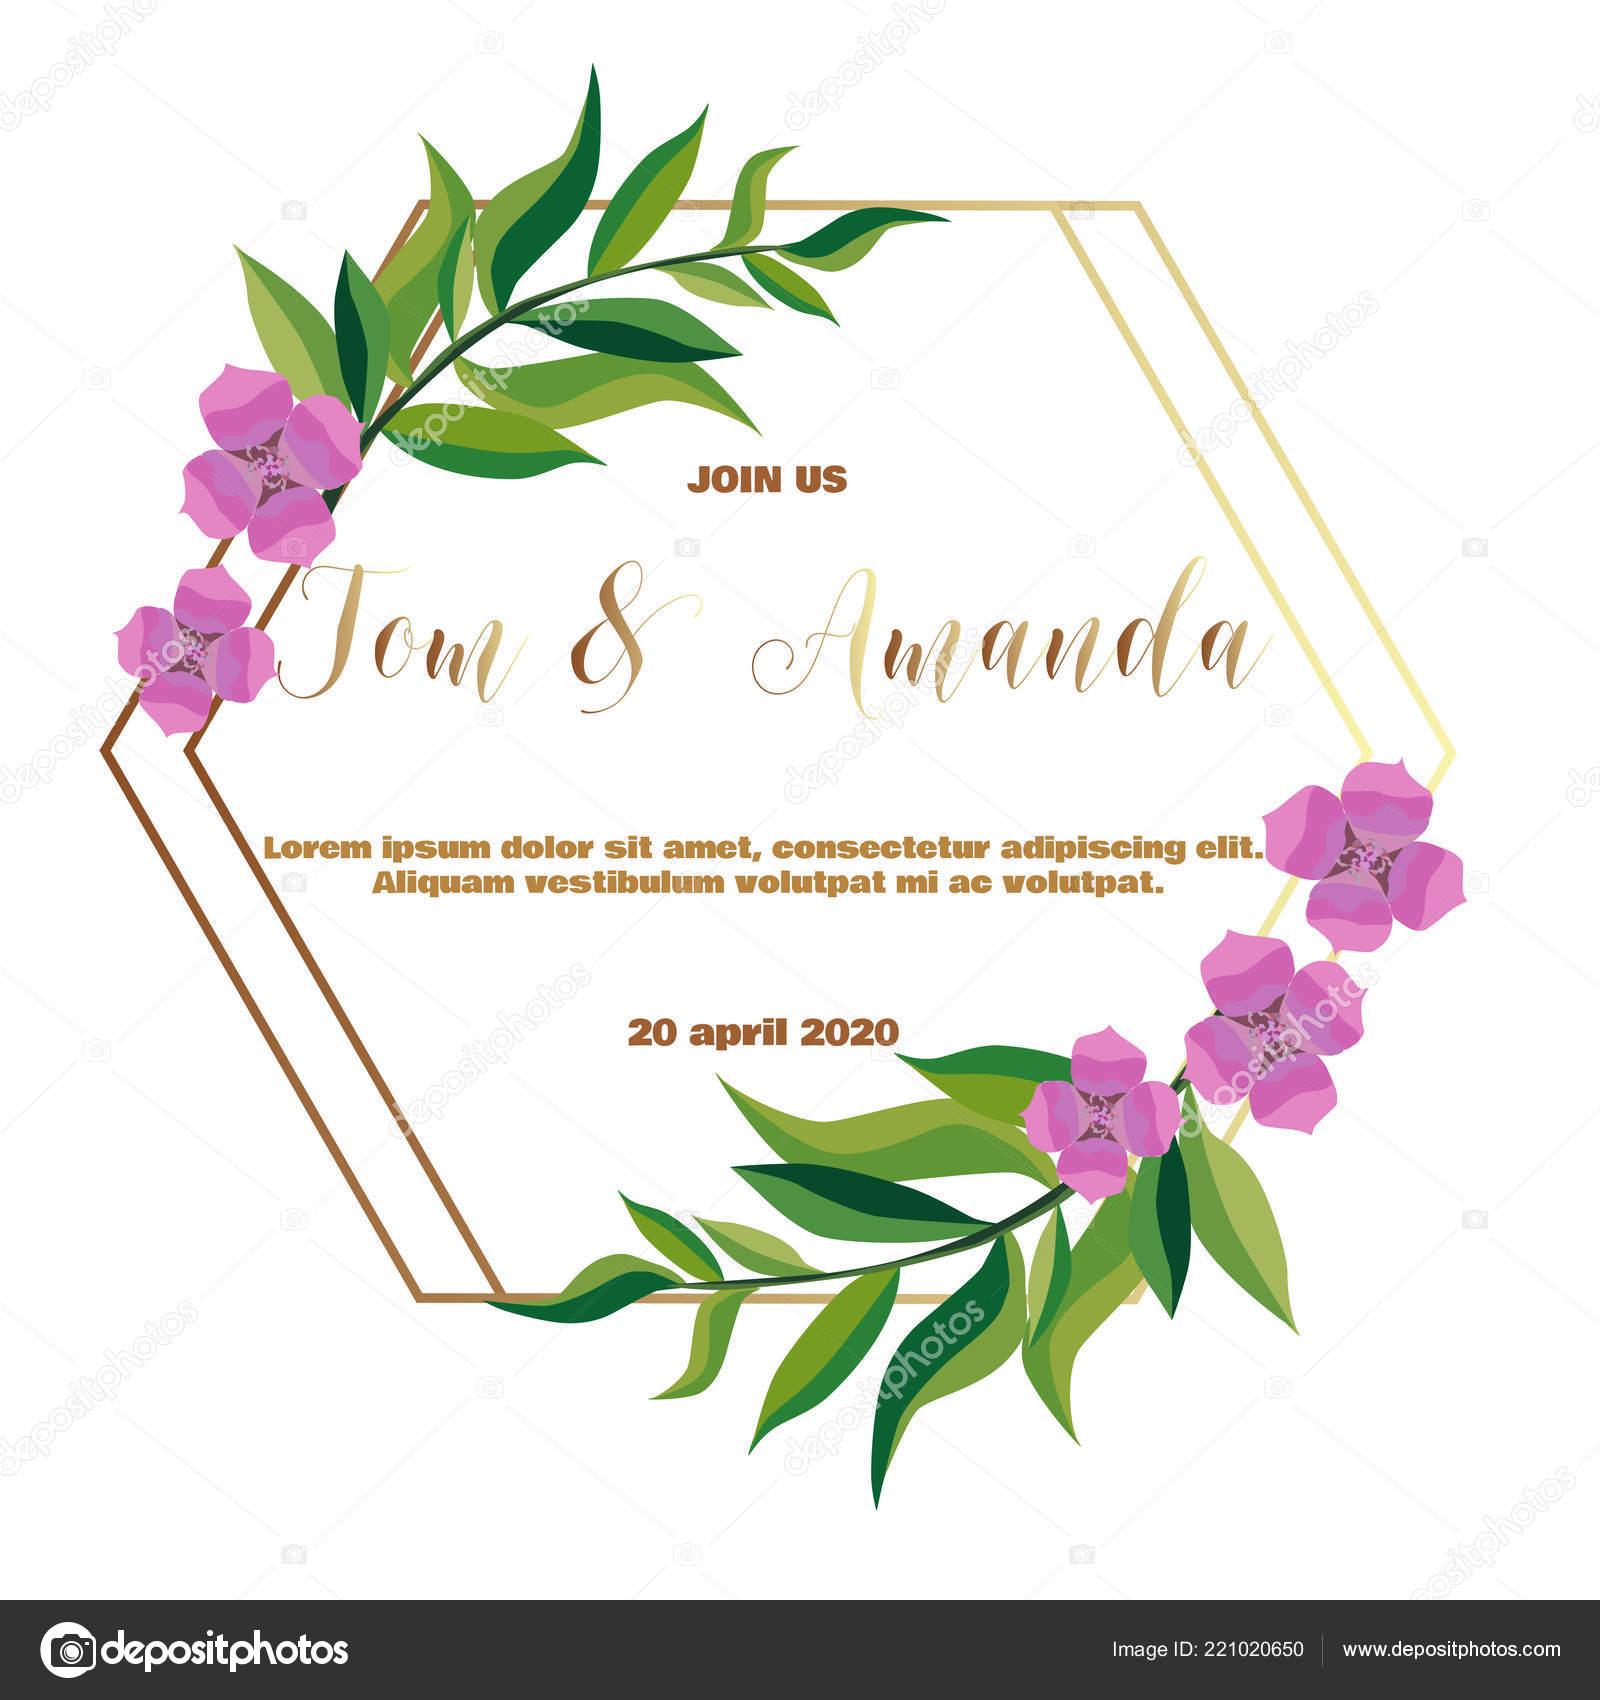 005 Fascinating Printable Wedding Invitation Template Concept  Free For Microsoft Word VintageFull